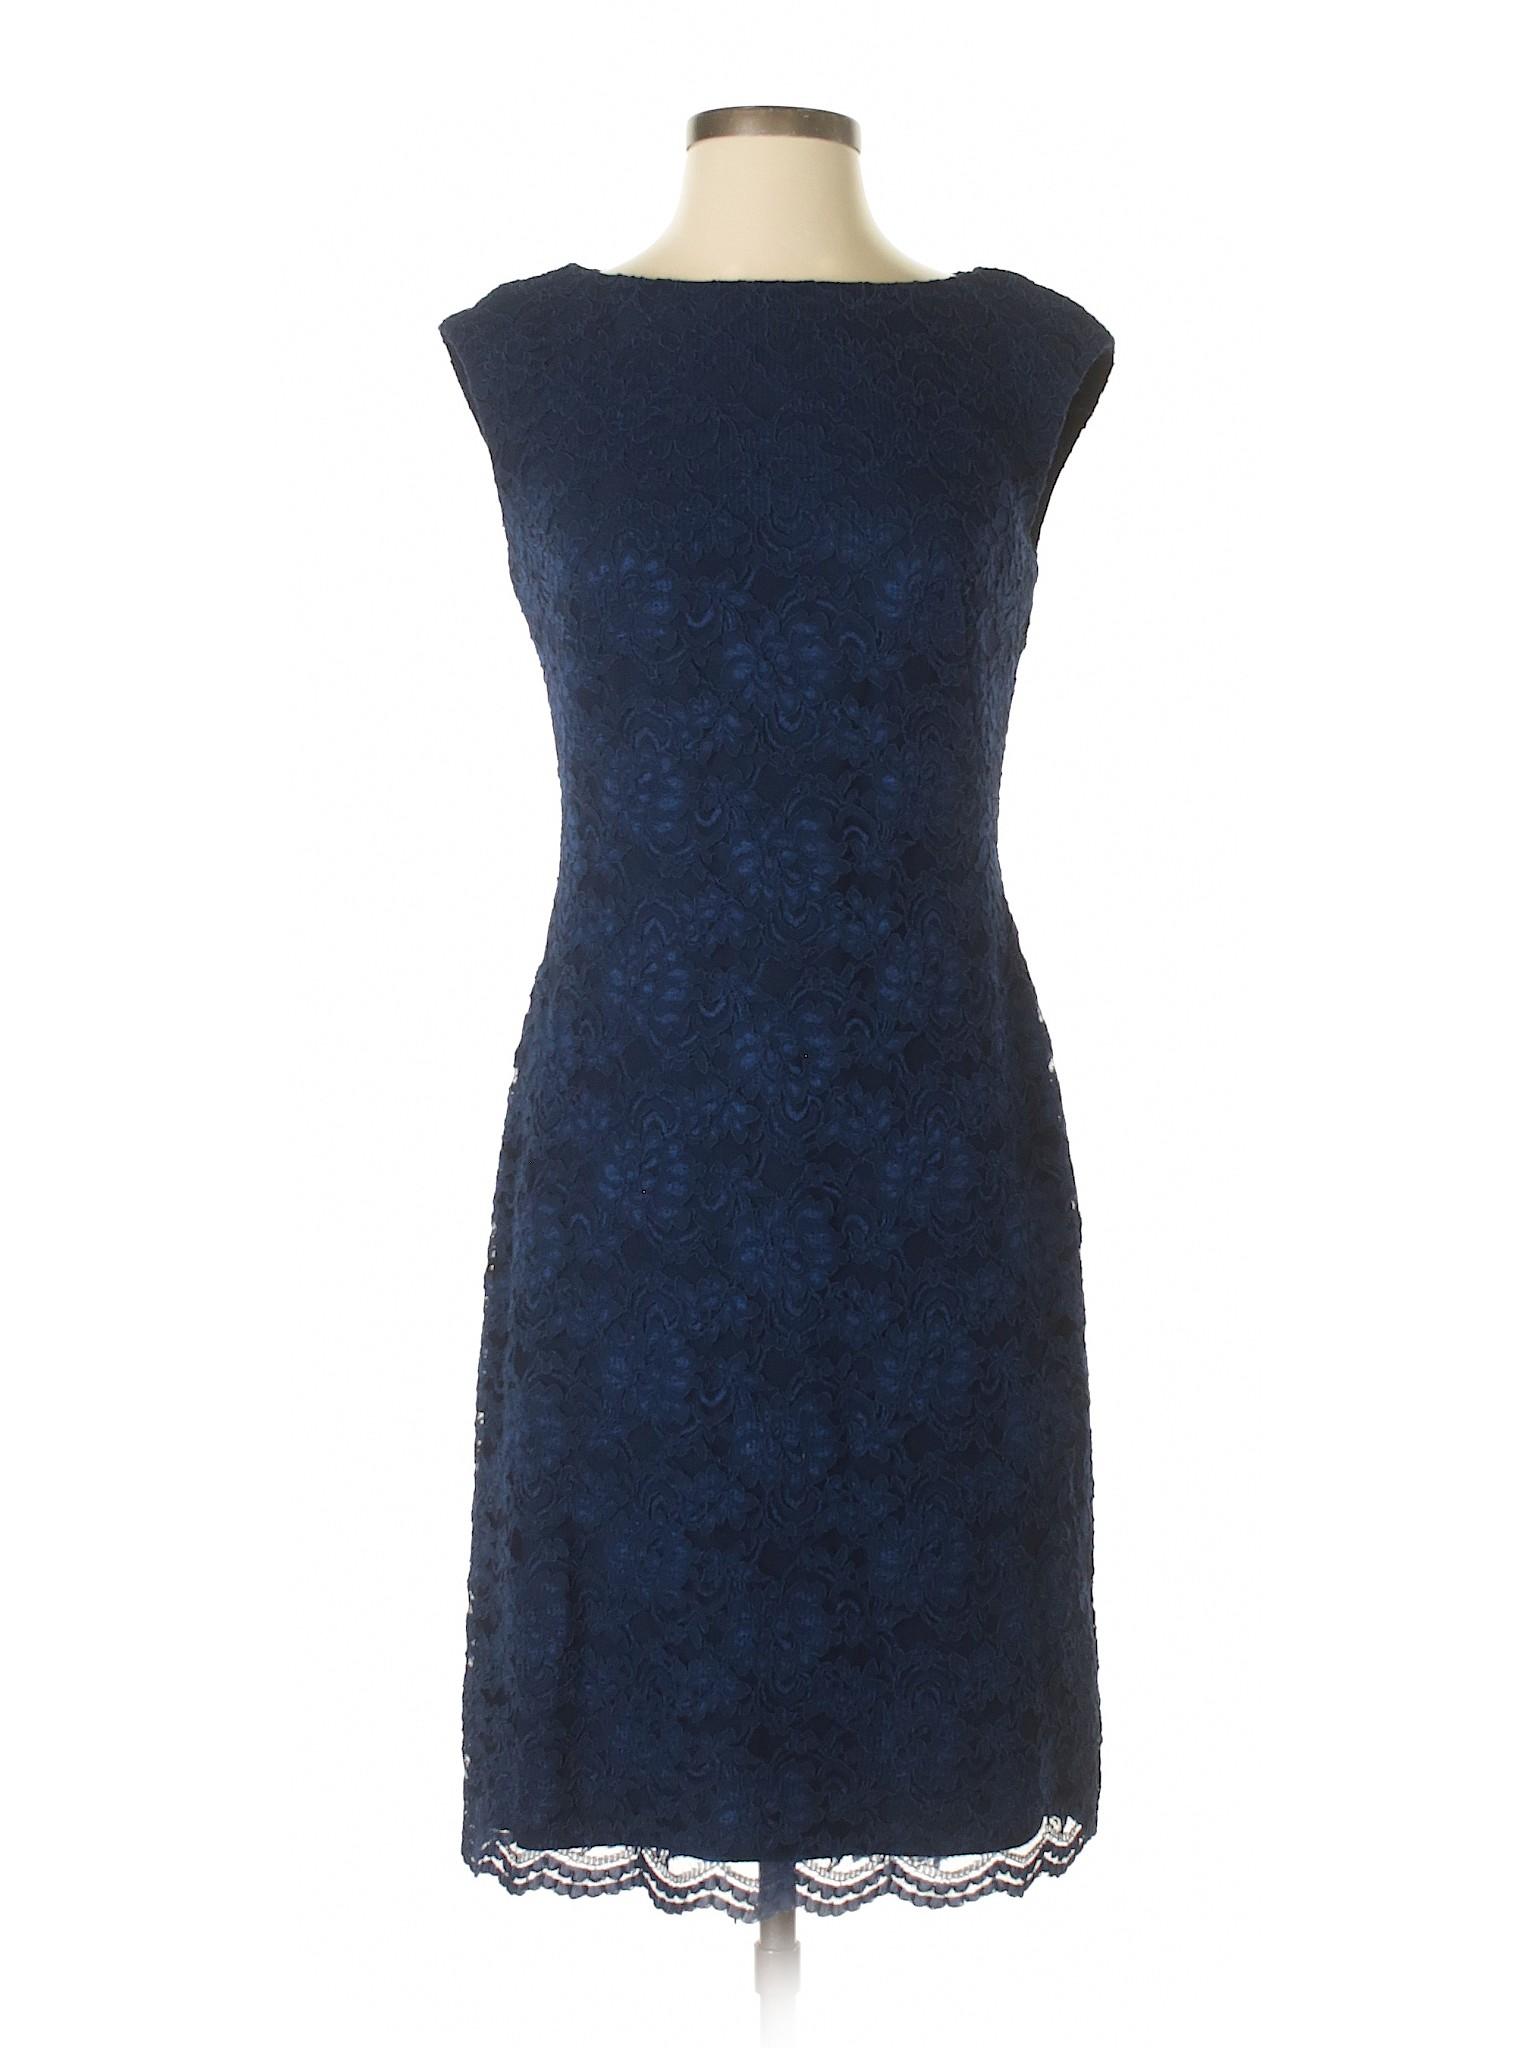 Dress by Casual Boutique Lauren winter Ralph Lauren w8qpx8T6HY